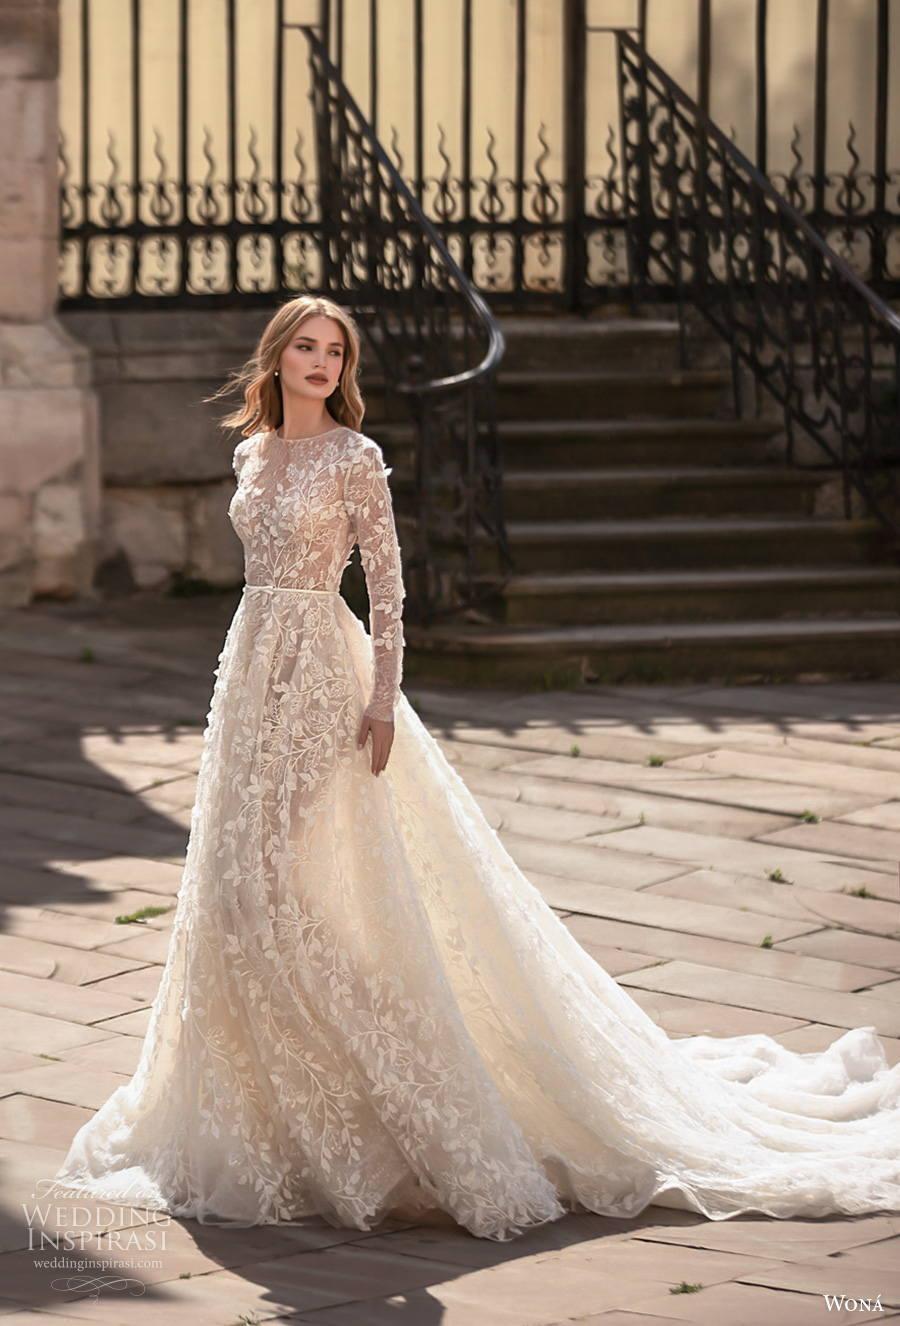 Wona Concept 2021 Romance Wedding Dresses Wedding Inspirasi Long Sleeve Wedding Dress Lace Modest Wedding Dresses With Sleeves Modest Bridal Gowns [ 1326 x 900 Pixel ]